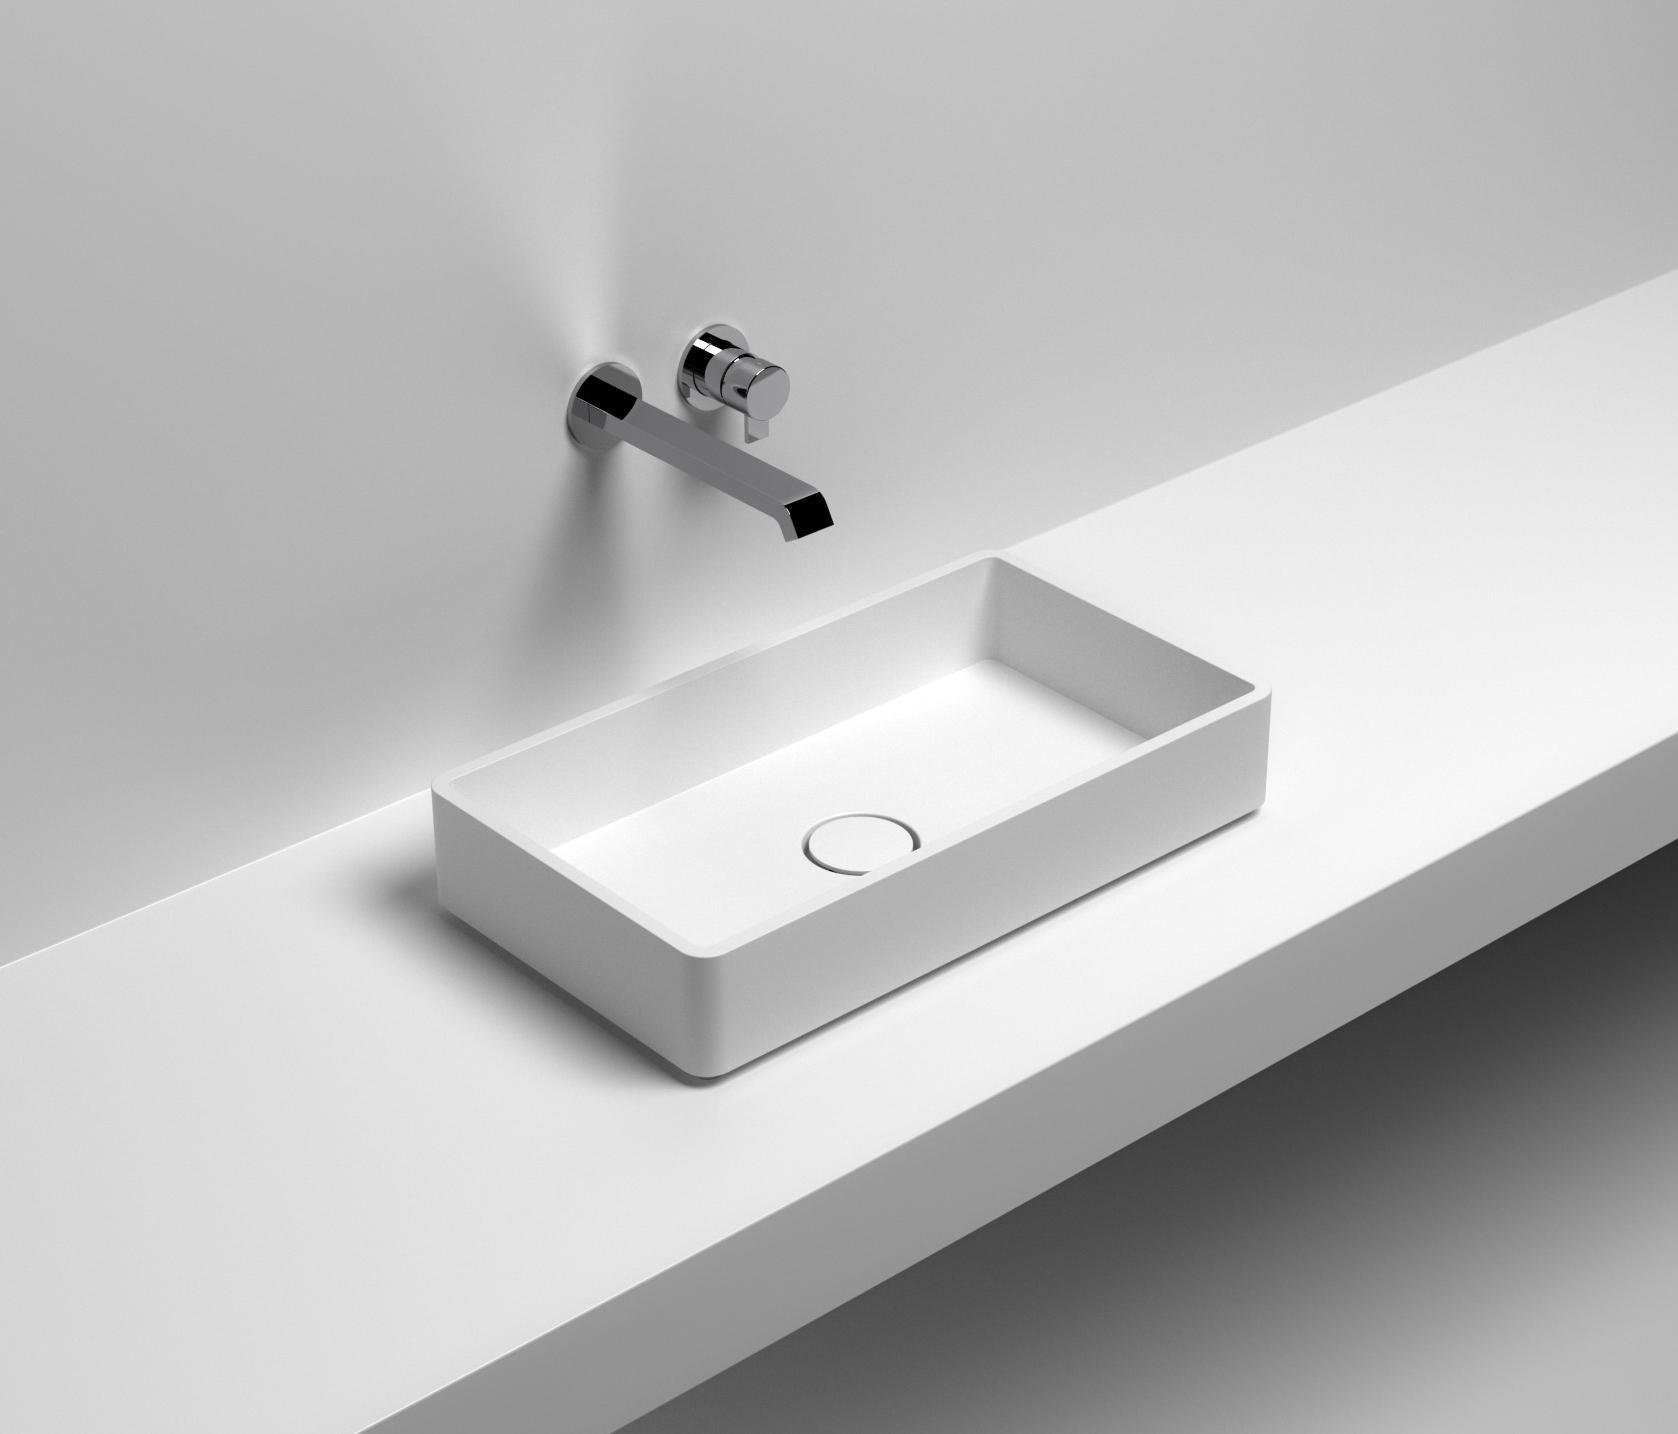 Senso Square Lavabo.New Square Wash Basins From Sign Architonic